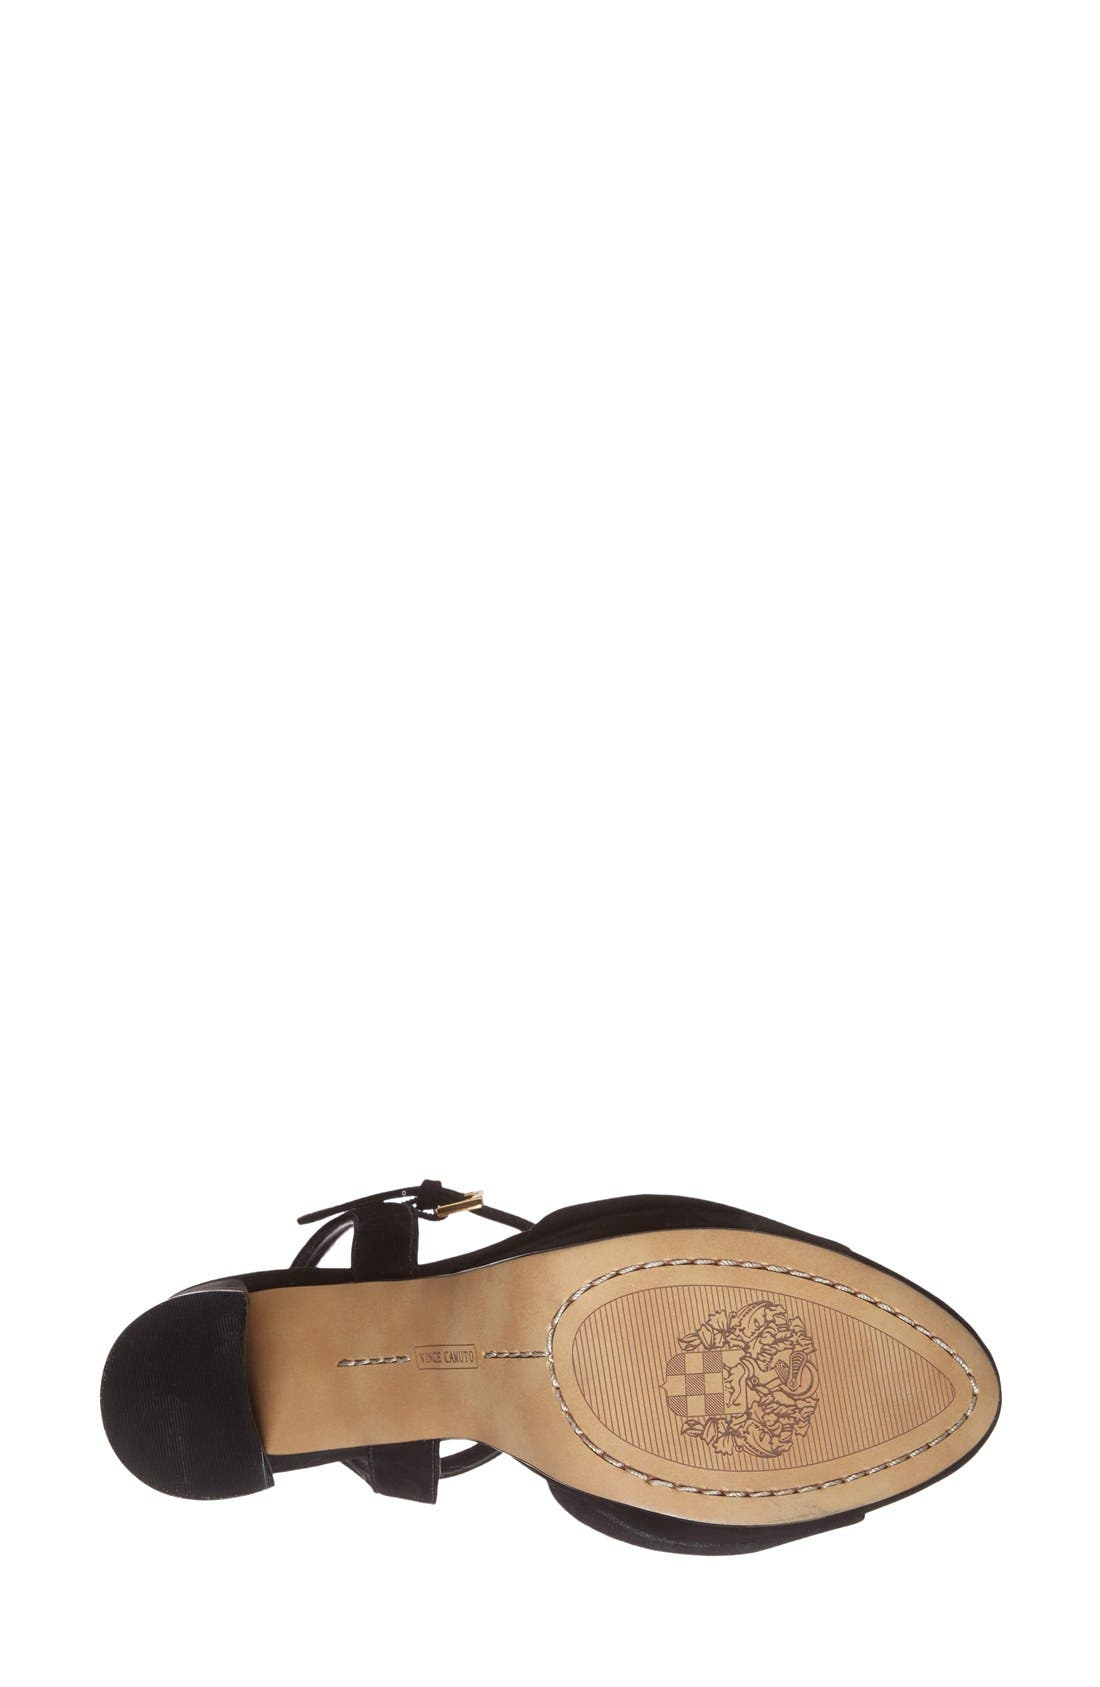 'Krysta' Platform Sandal,                             Alternate thumbnail 4, color,                             001